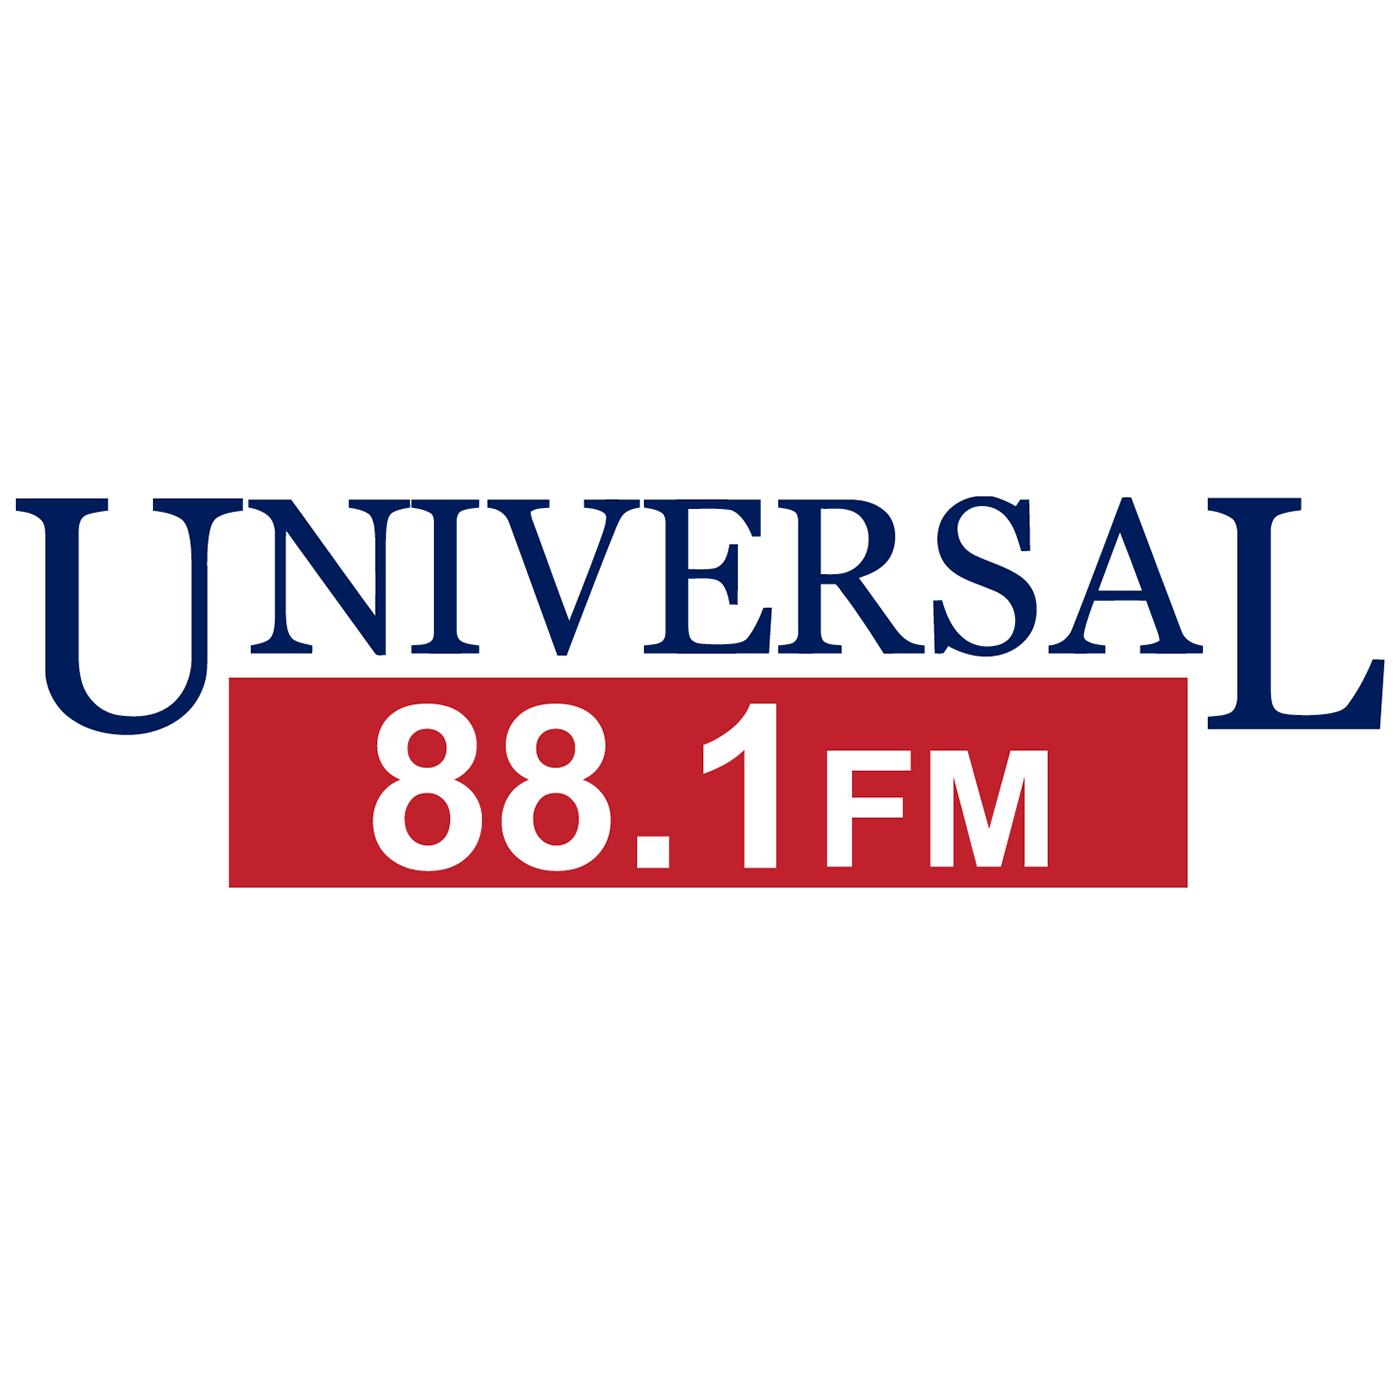 Universal 88.1FM